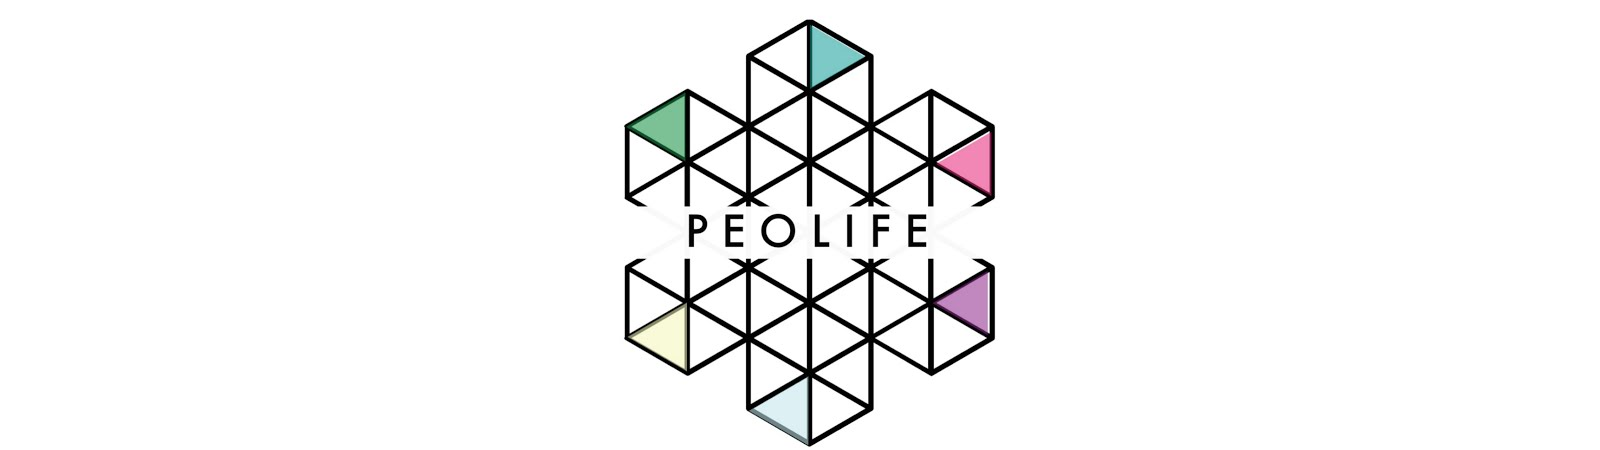 peolife